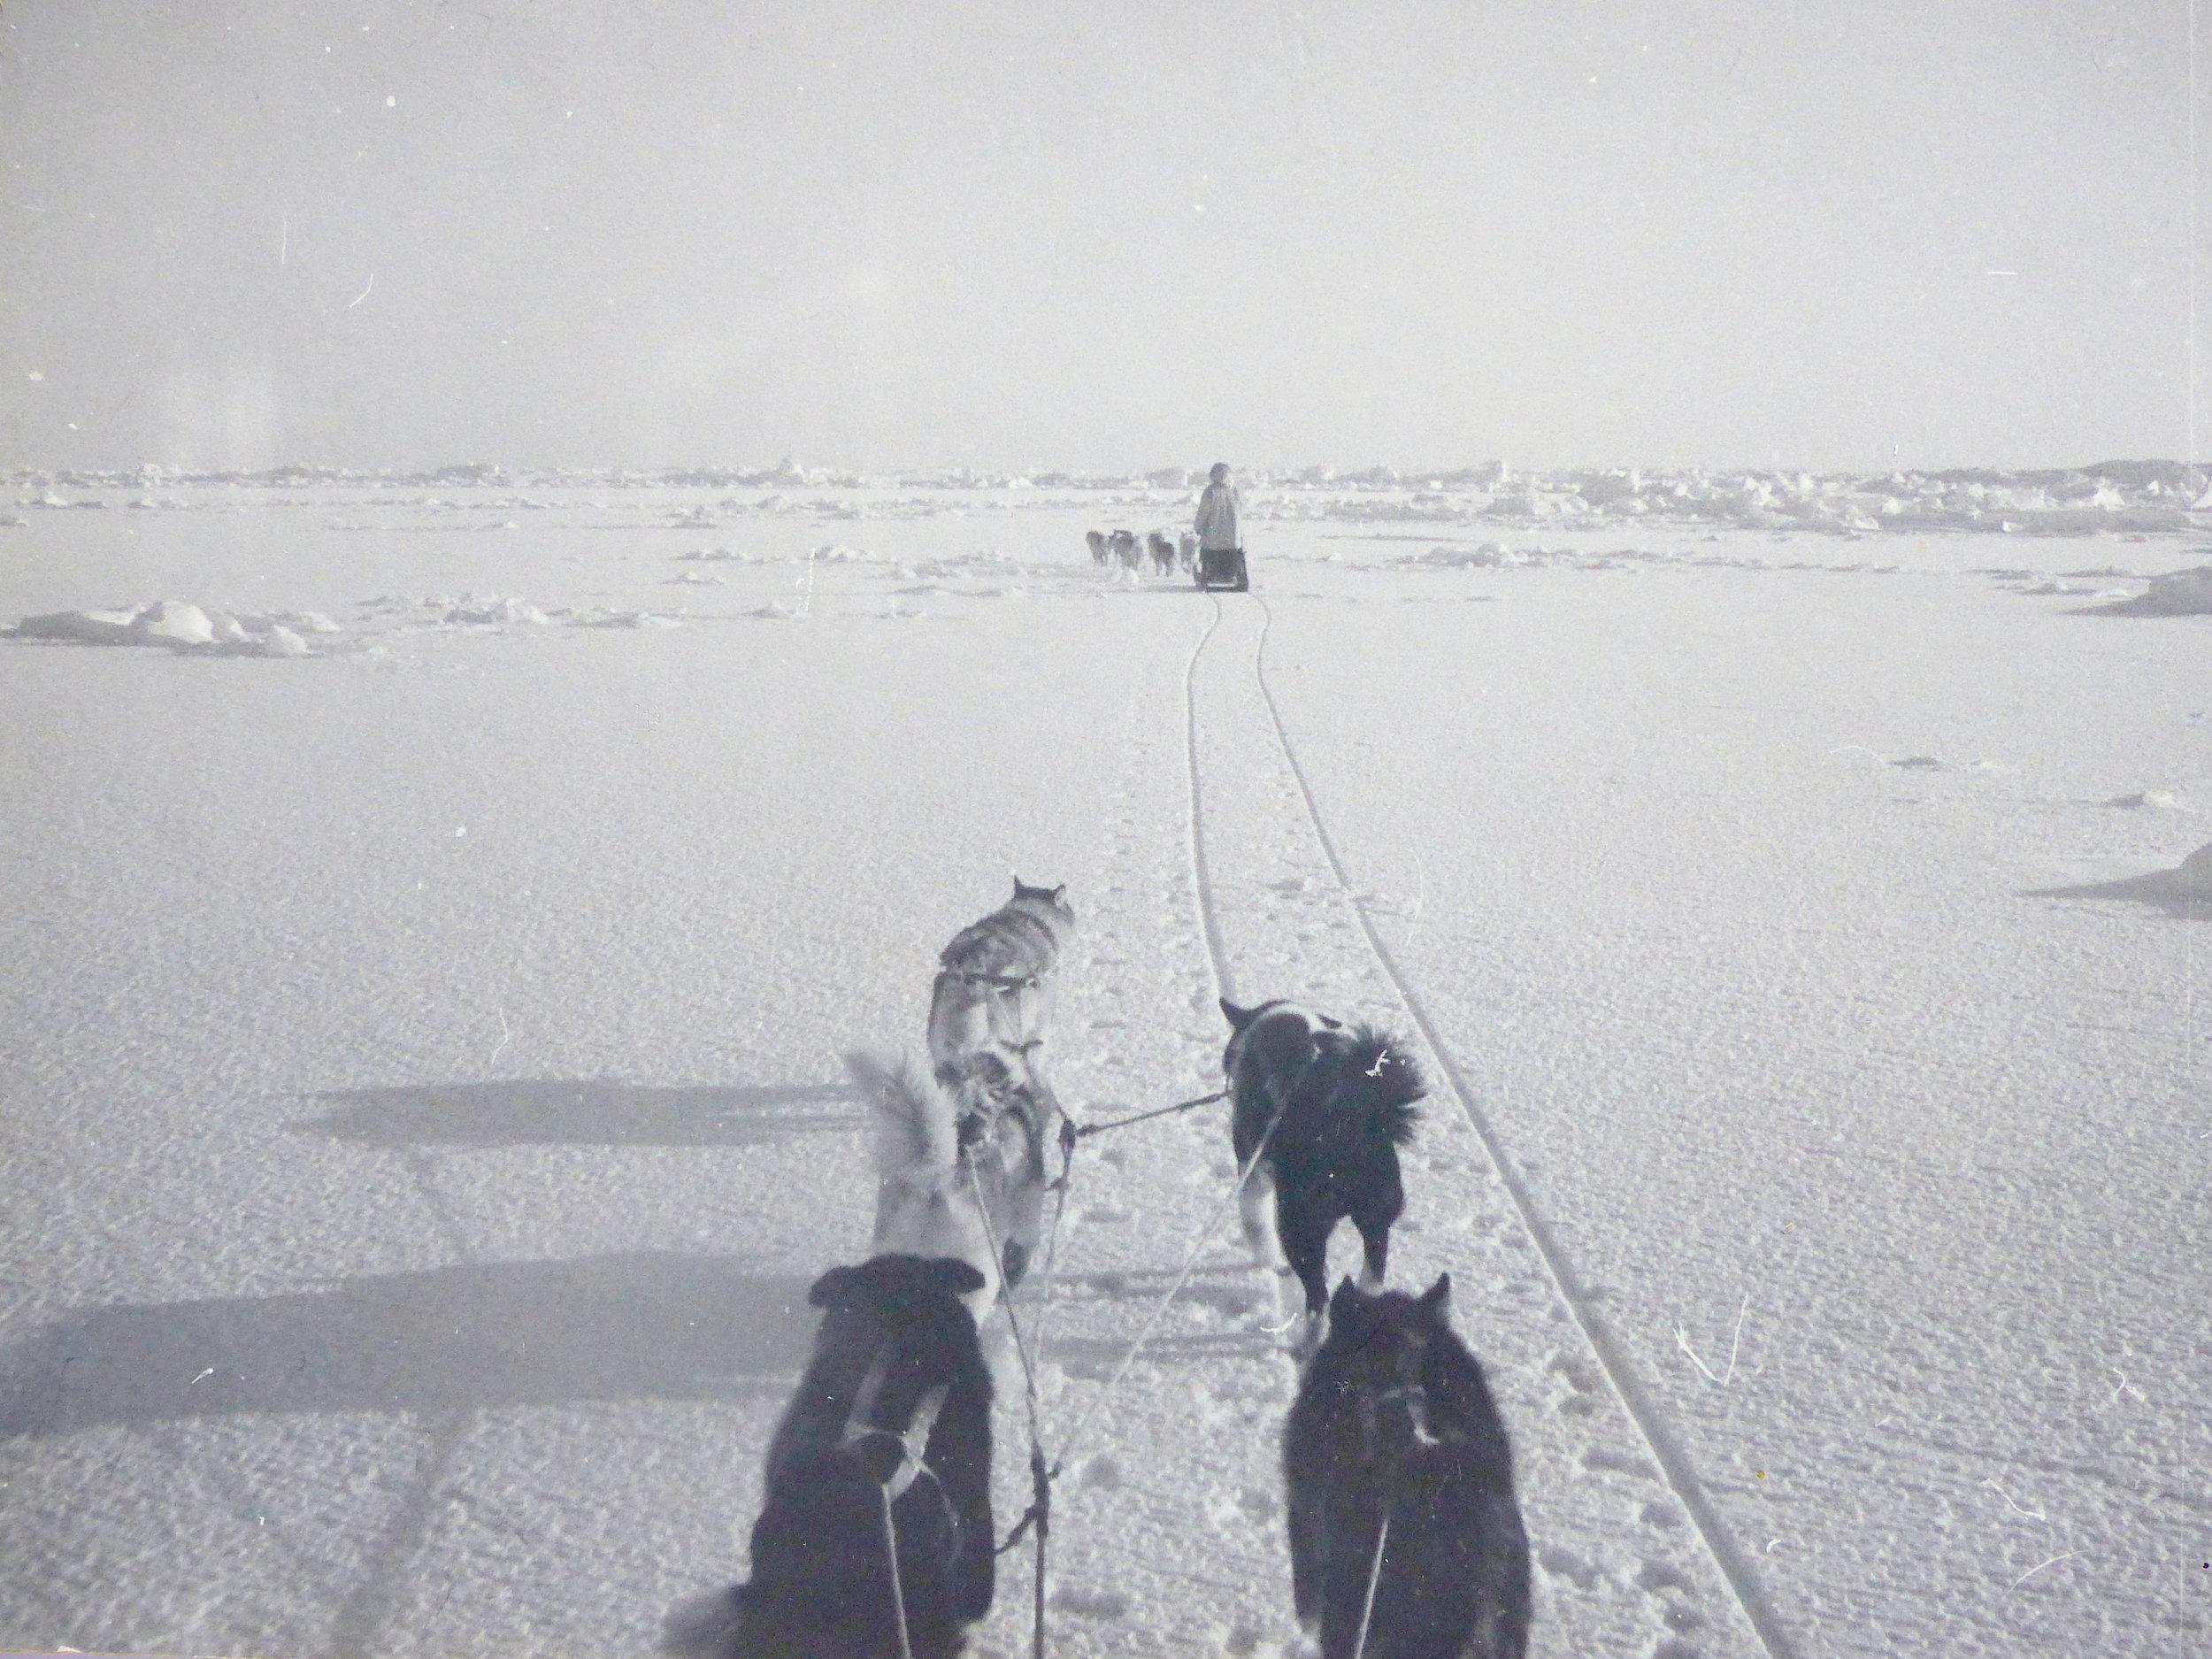 Inupiaq seal hunters traveling on the sea ice near Wainwright, on the Arctic Coast of Alaska (1965 photo).